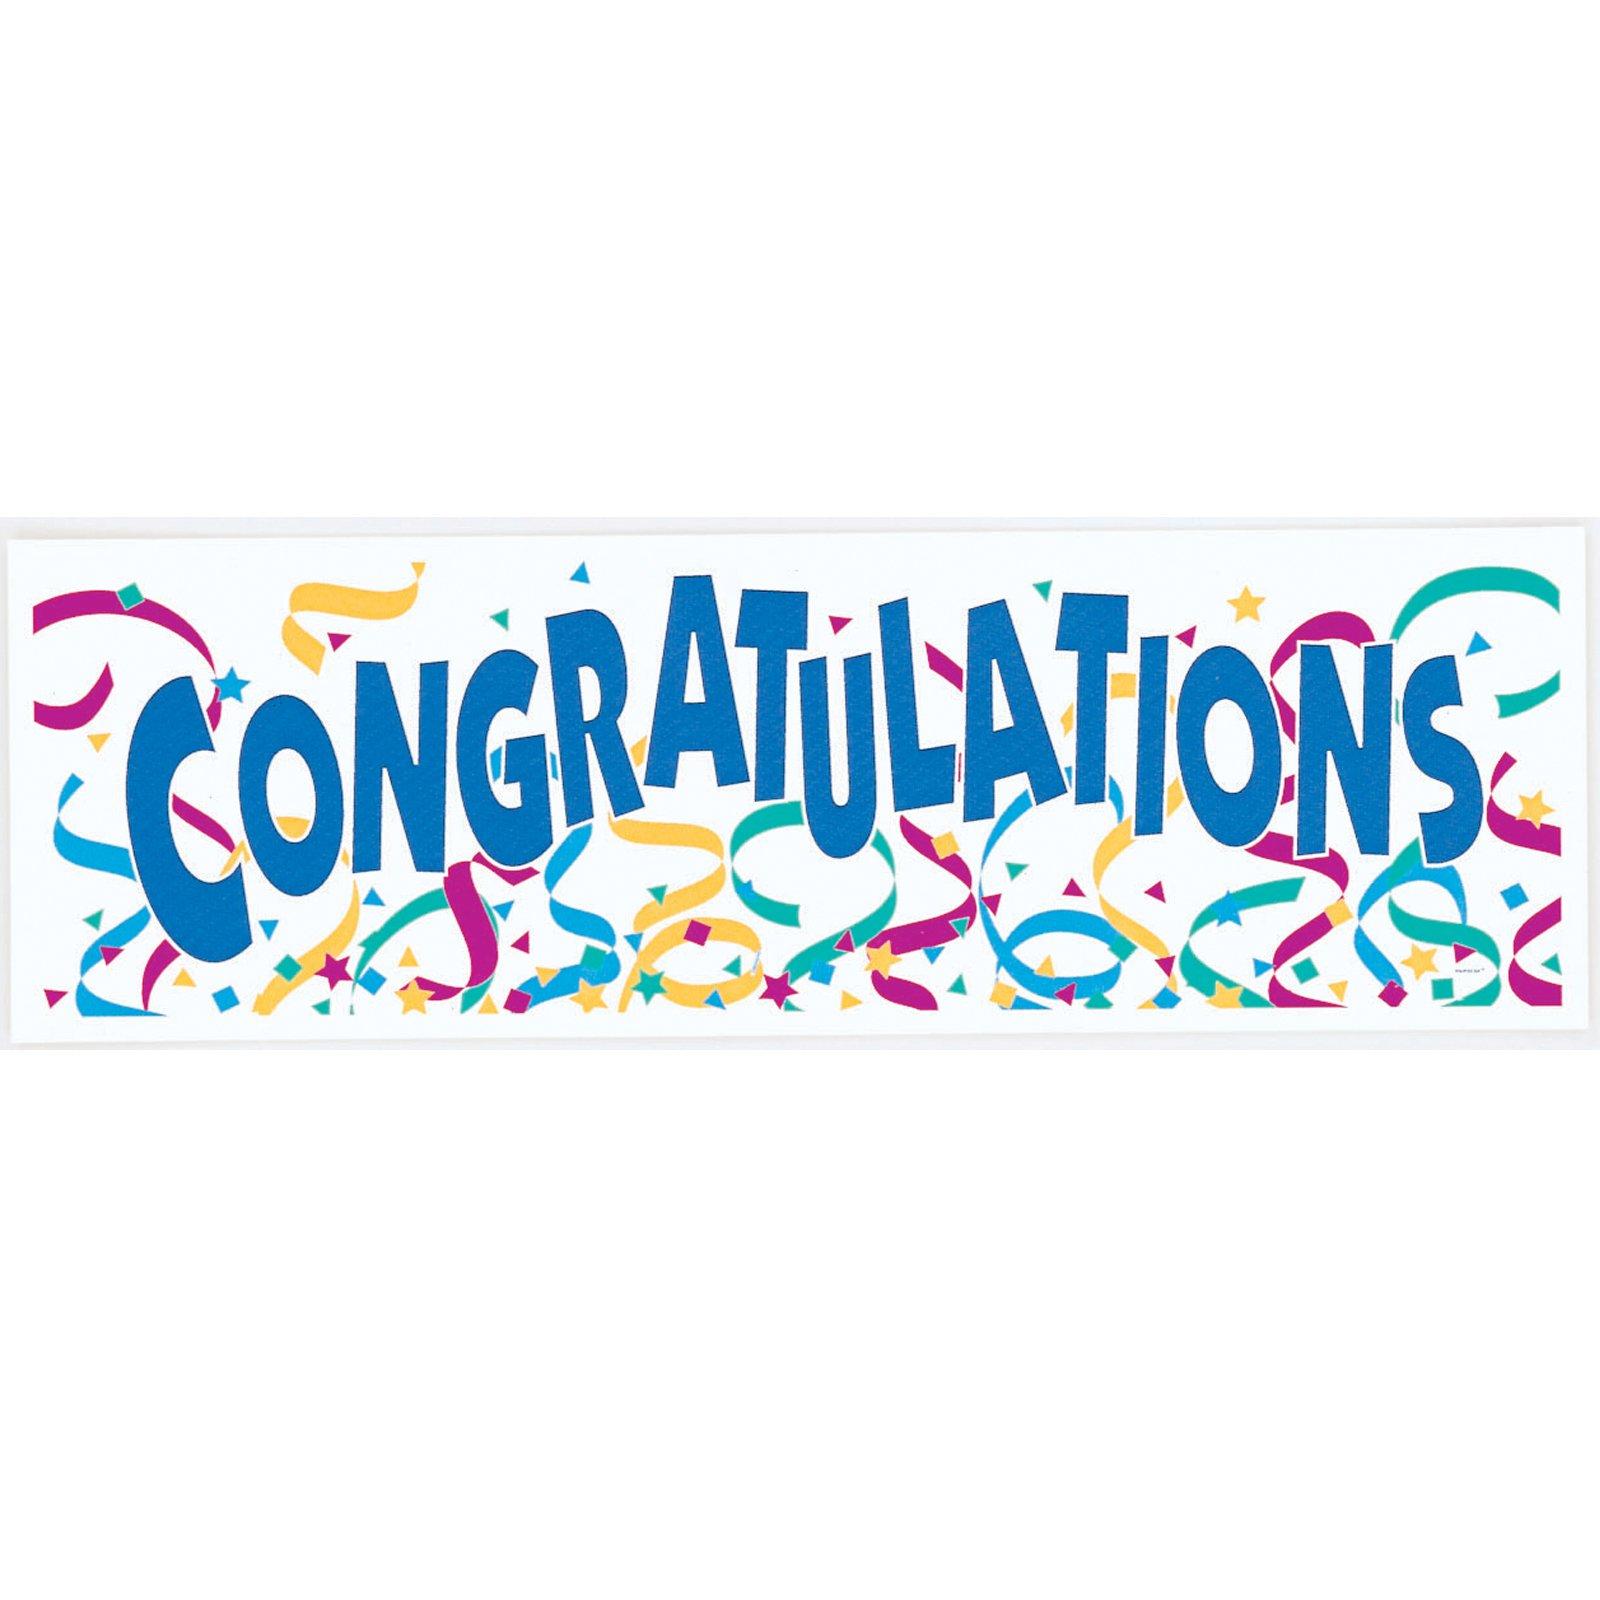 Congratulations Banner Clipart - Clipart Kid